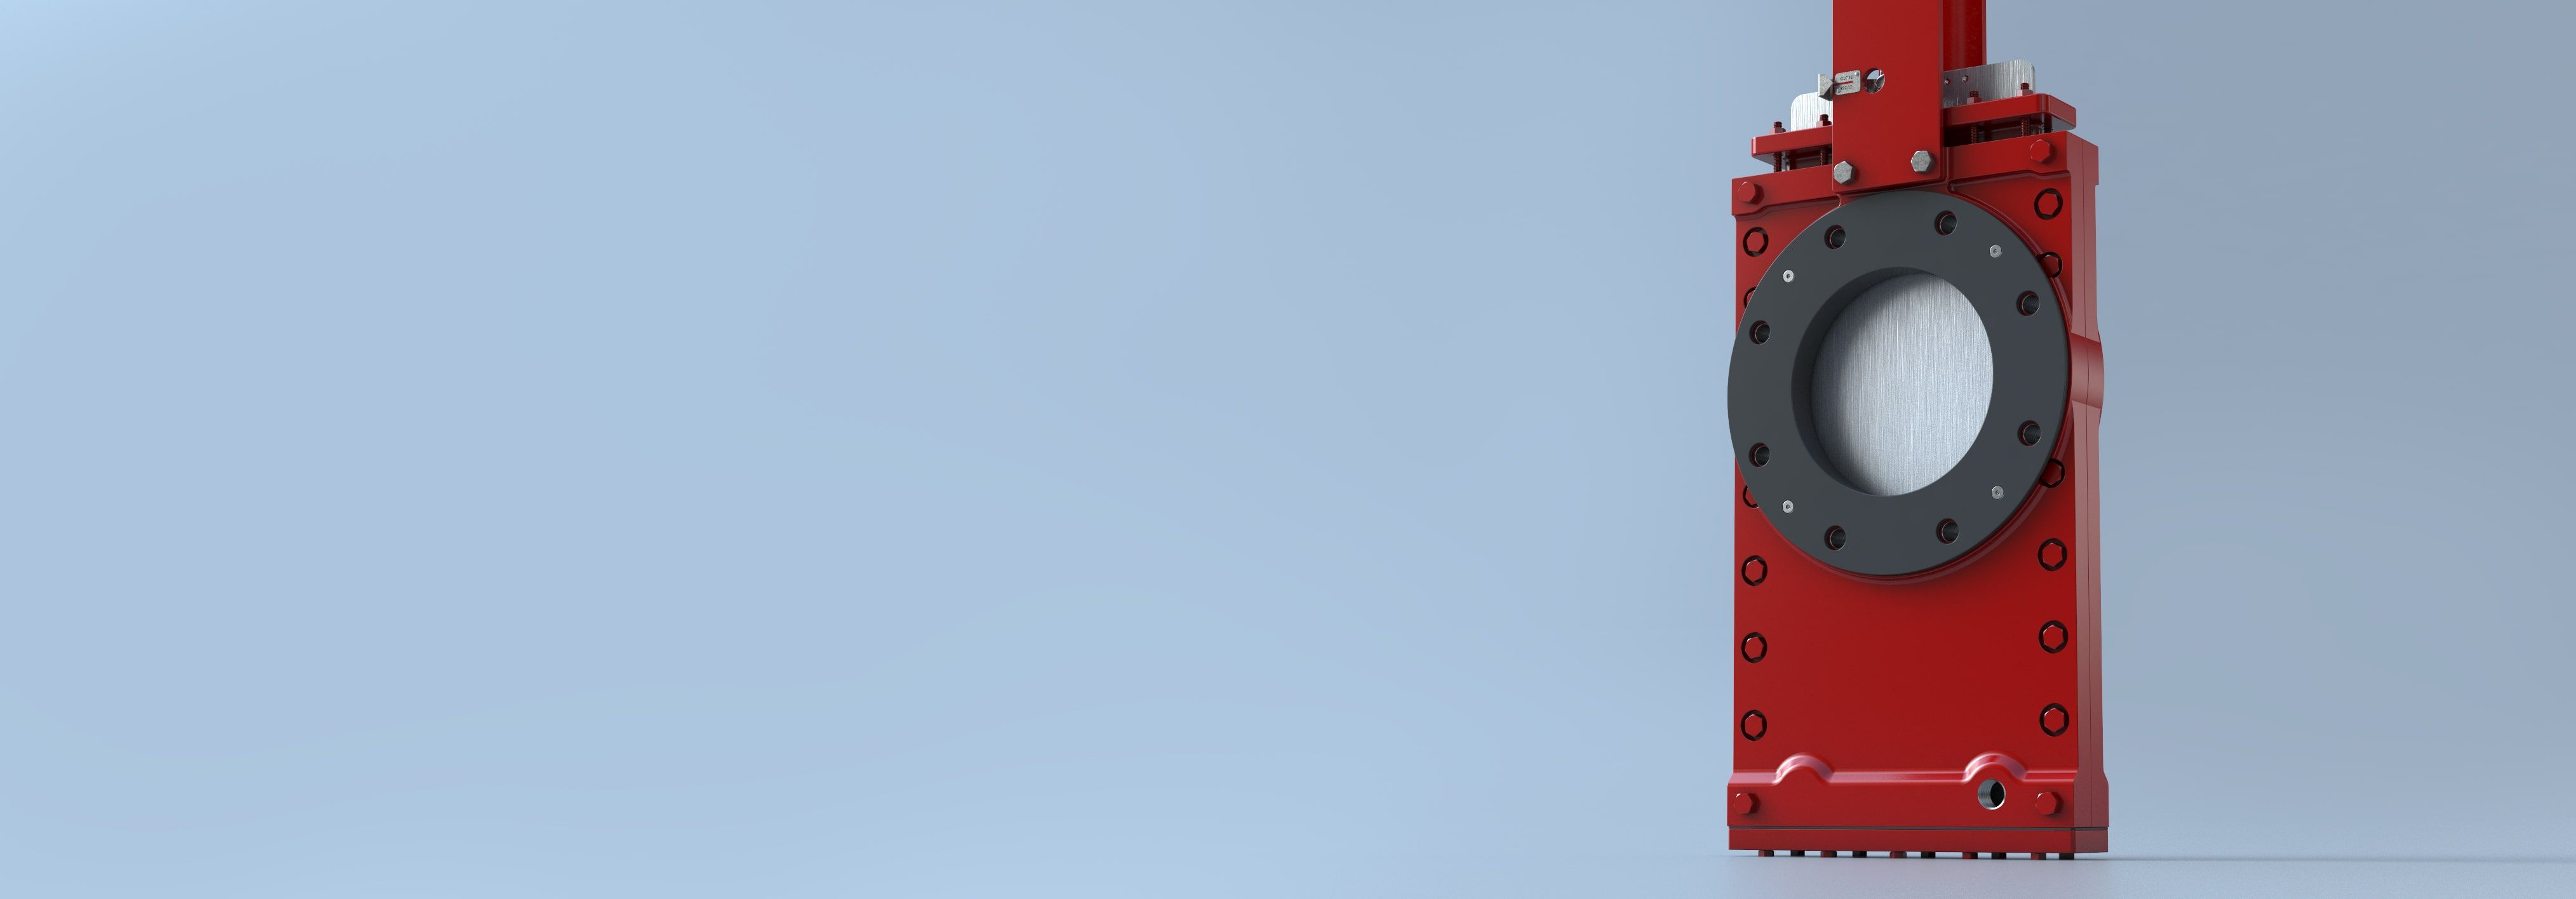 Válvula guilhotina bidirecional da Série 770 Bray International